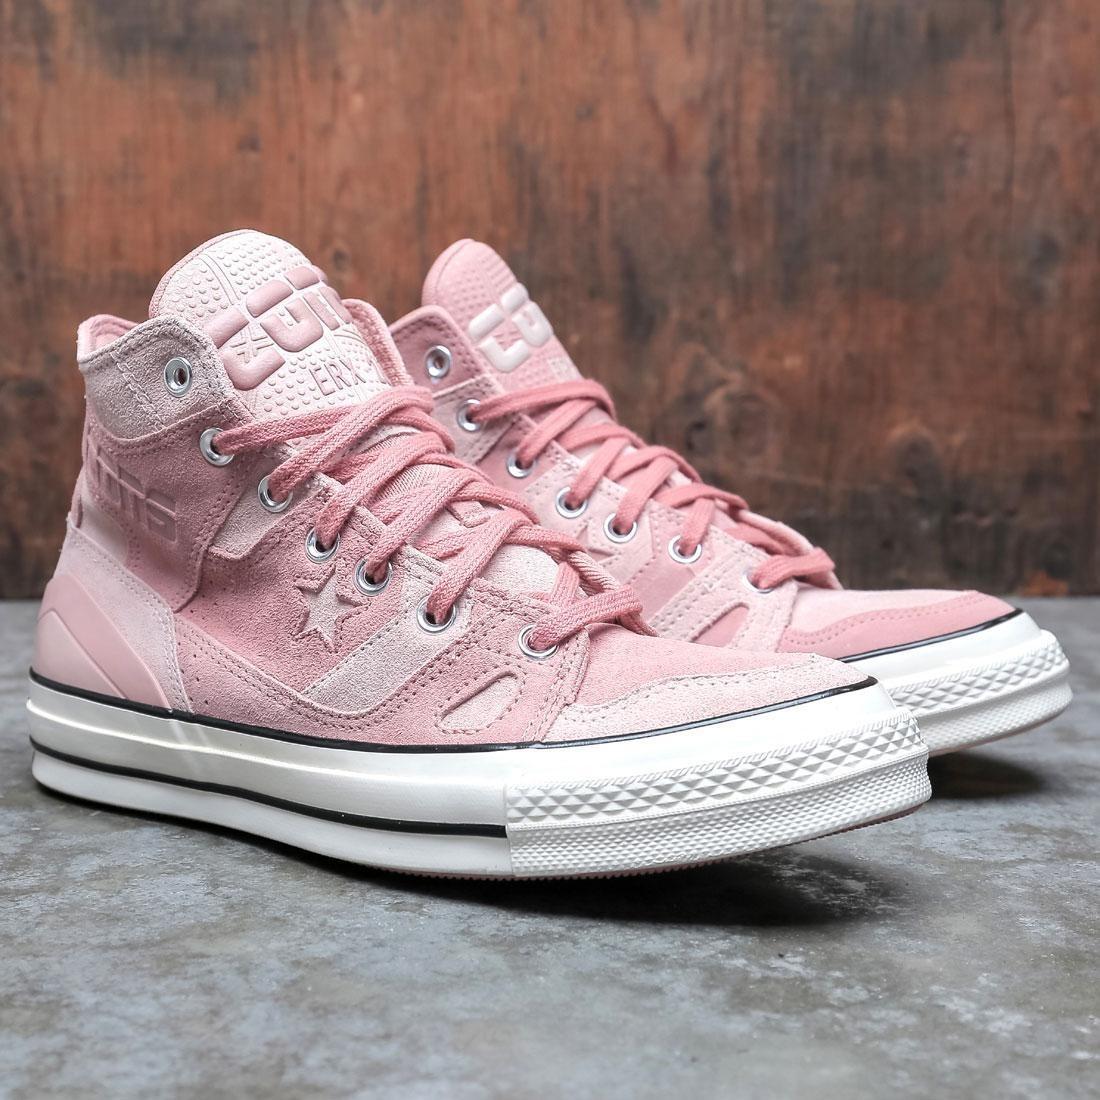 Converse Men Earth Tone Suede Chuck 70 E260 (pink / cameo brown / cameo rose / egret)